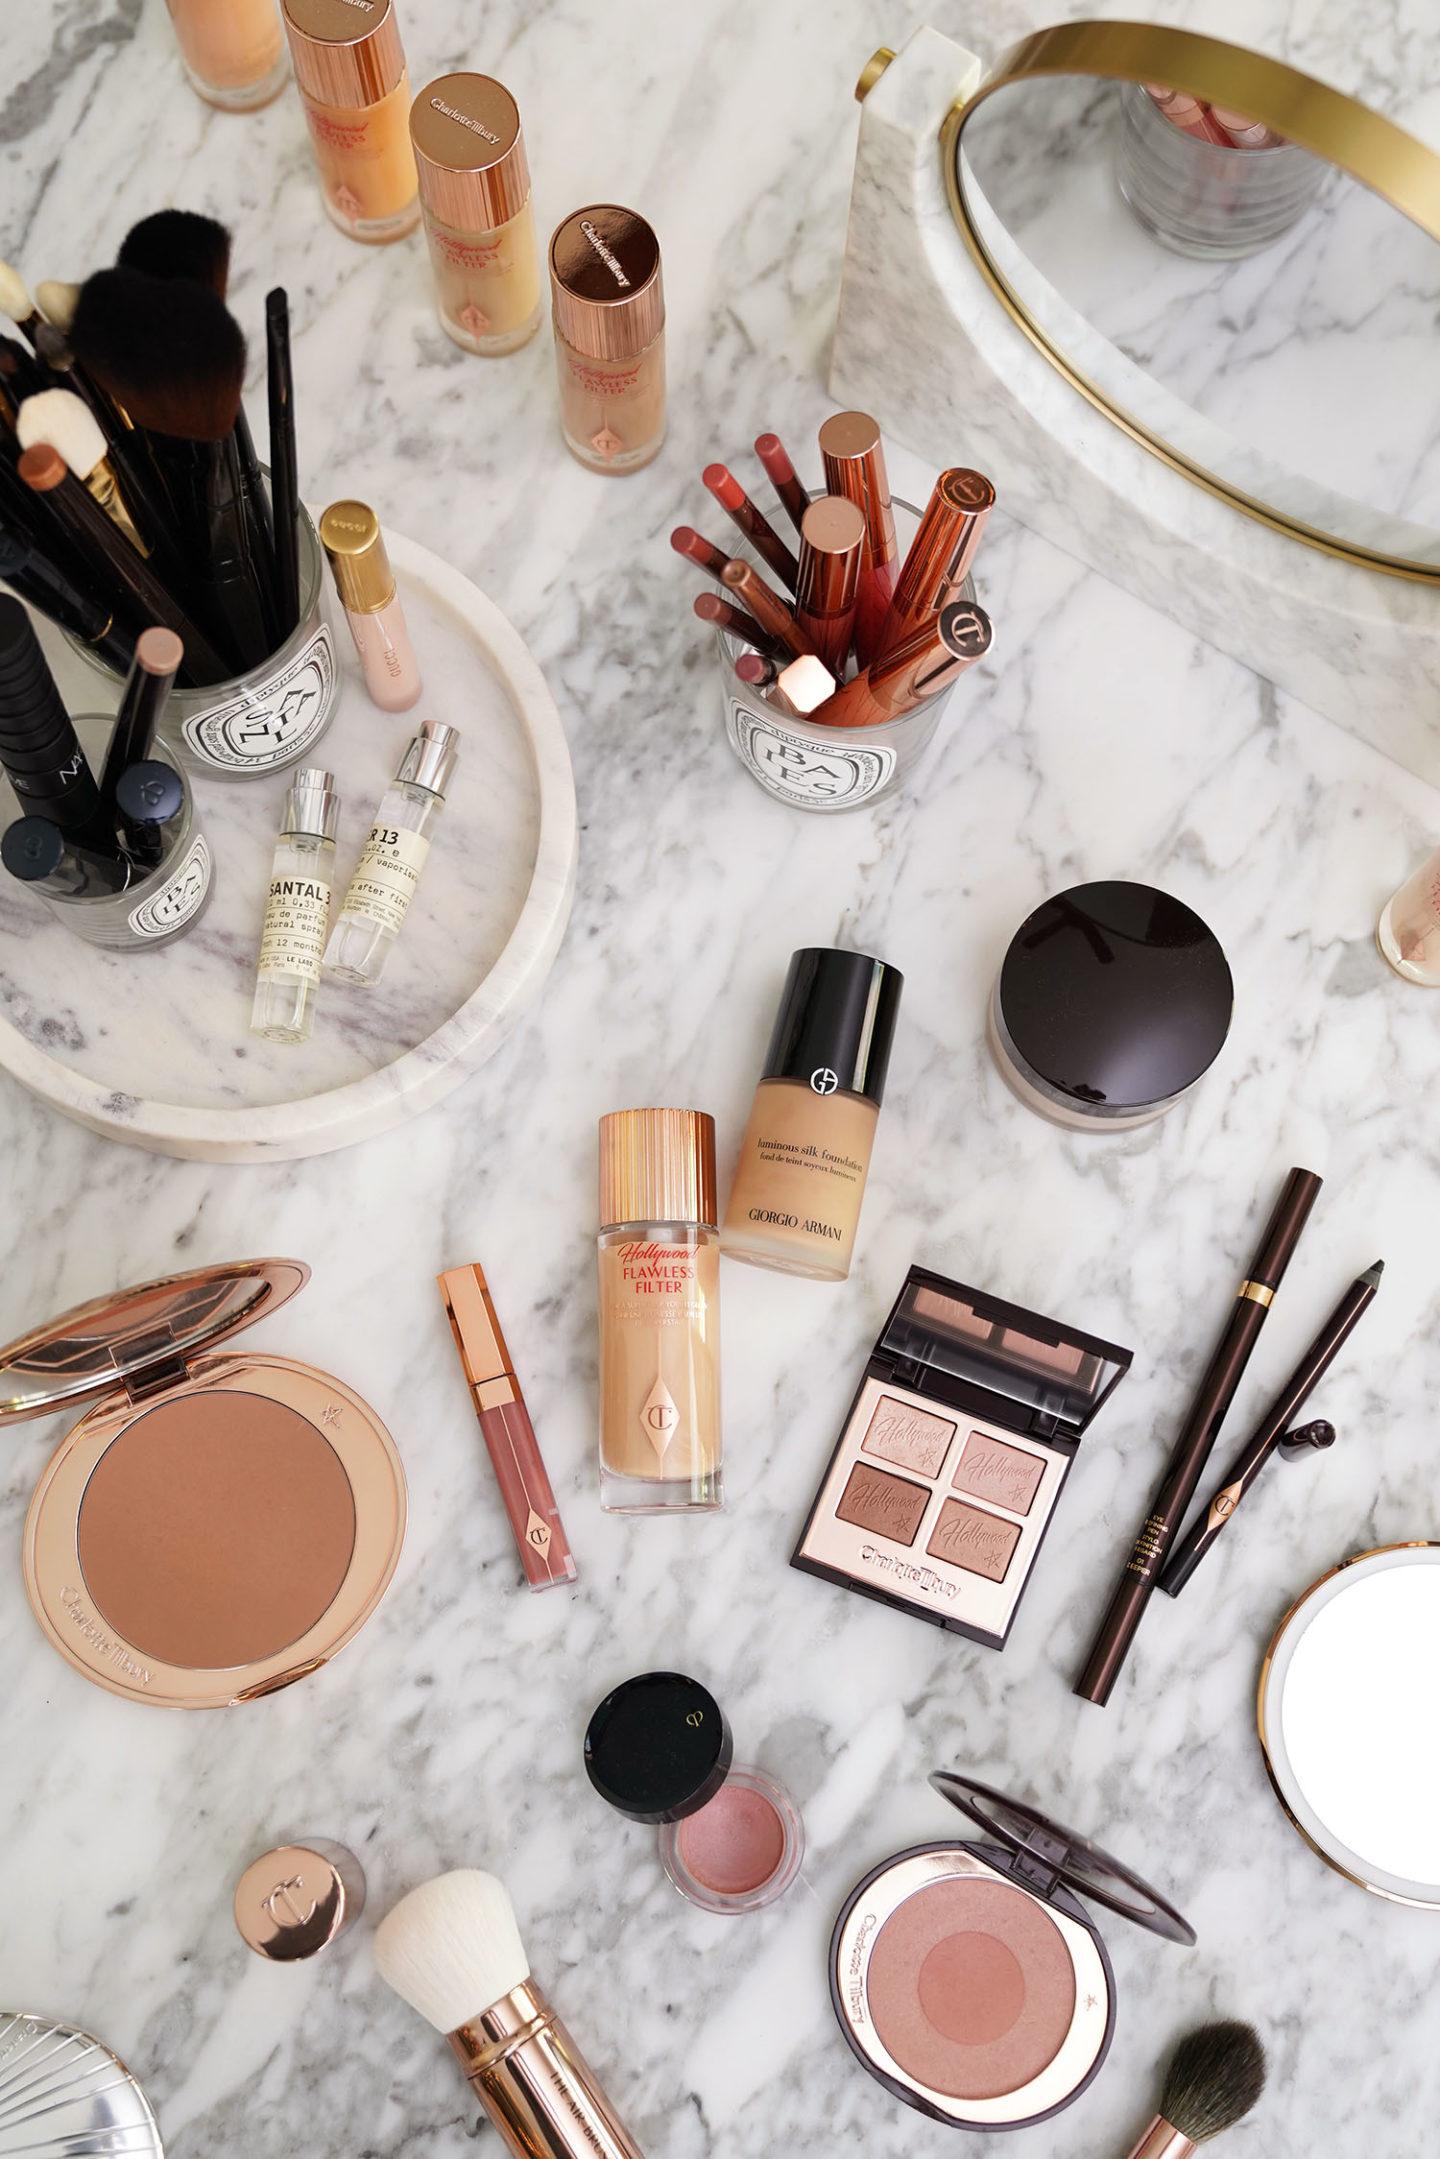 Maquillage Glowy Favoris de Nordstrom